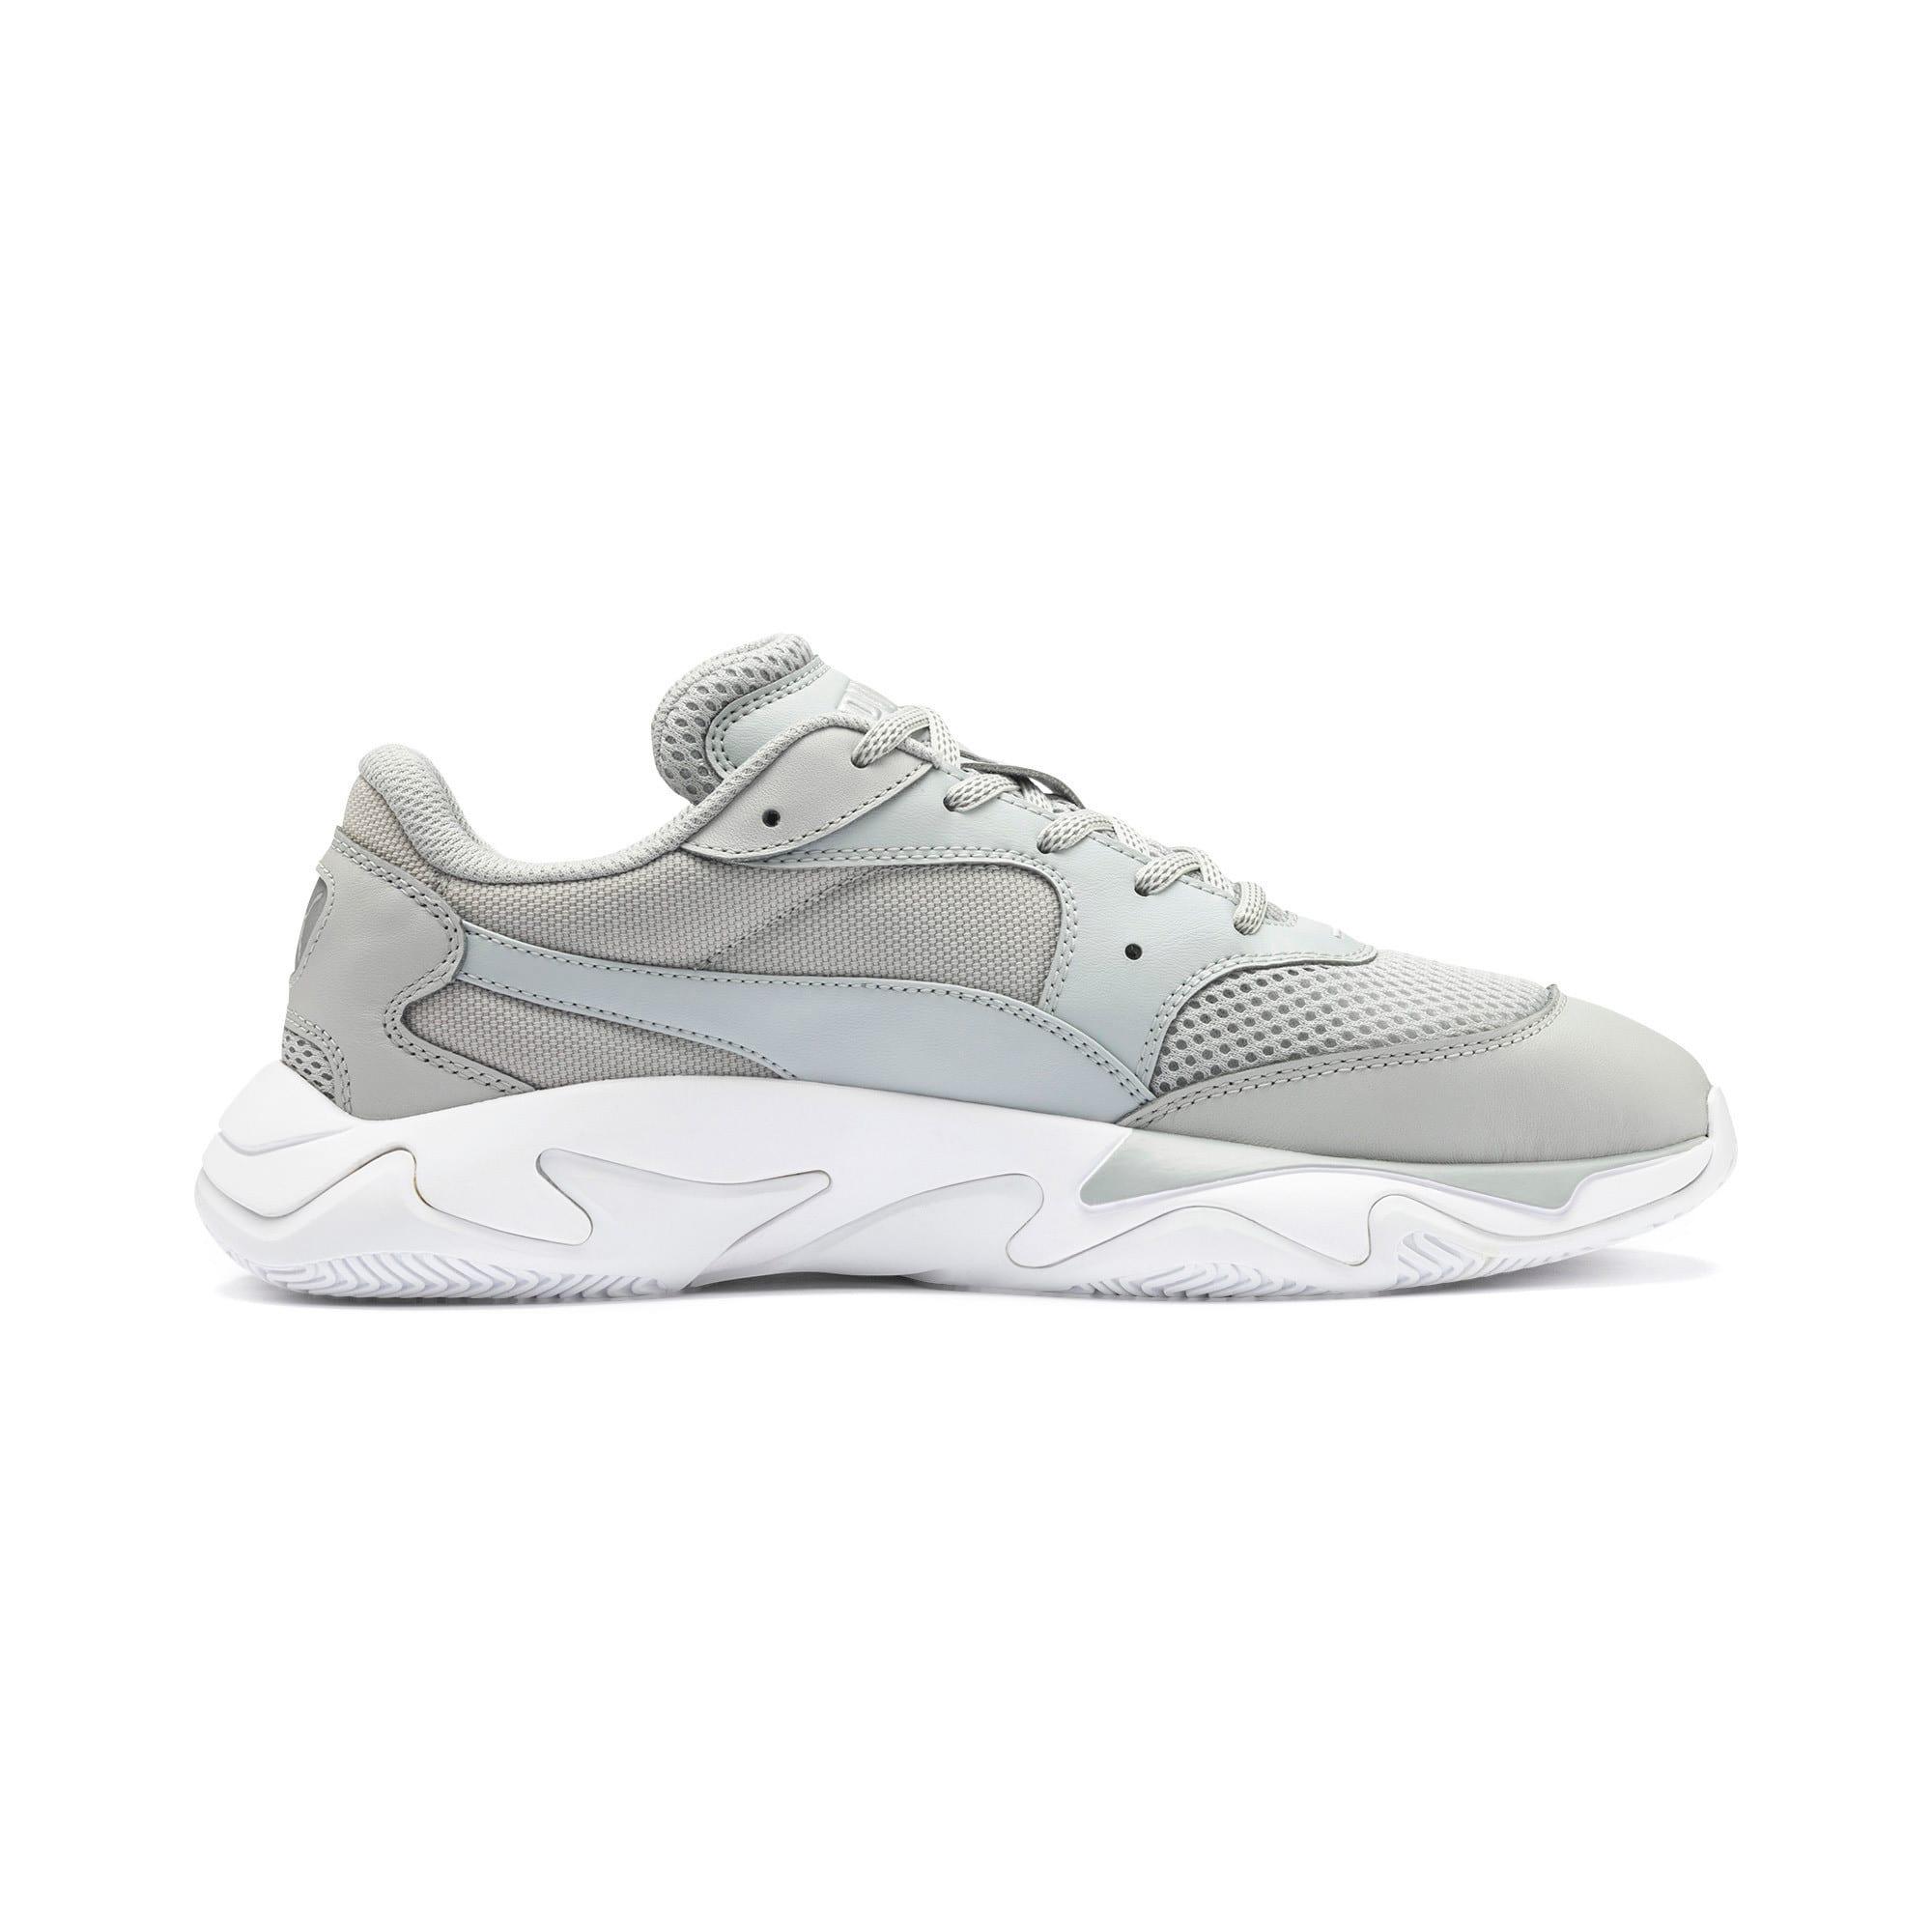 Miniatura 6 de Zapatos deportivos Storm Pulse, High Rise, mediano